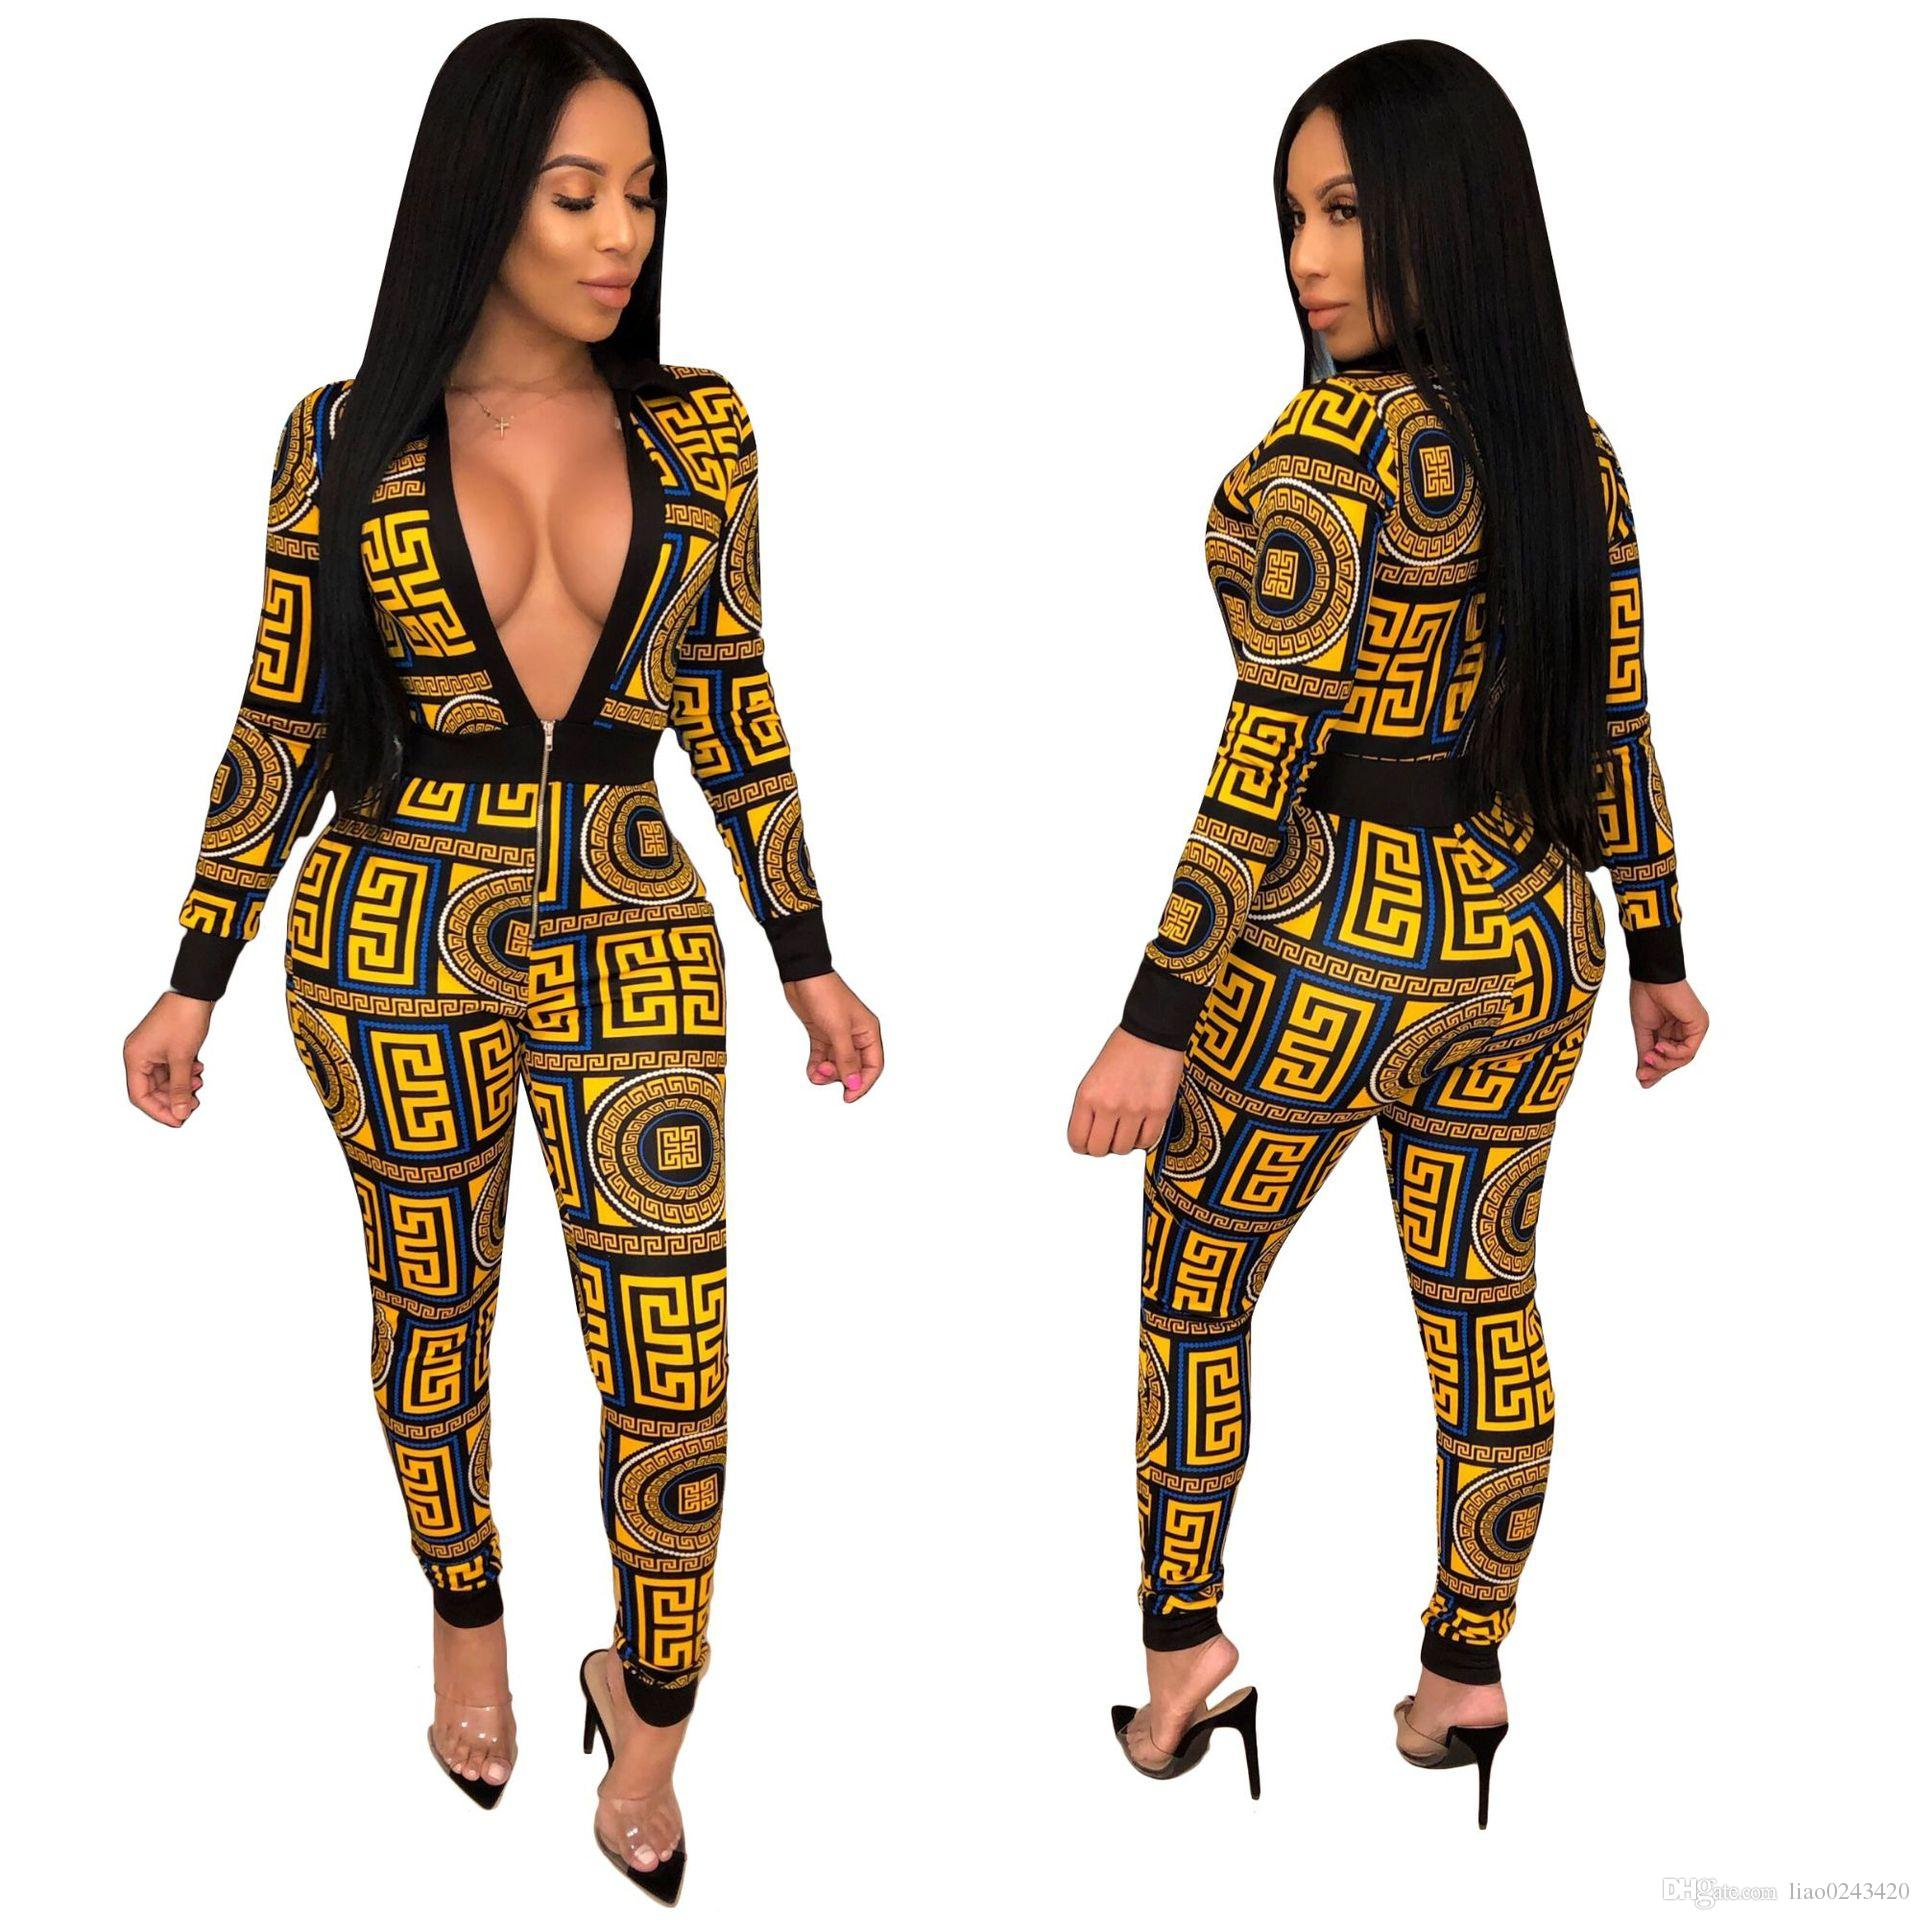 f4facb4cd1 Freies Schiff 2019 Neue Frauen Sexy Zipper Neck Print Engen Overall  Strampler Dame Hohe Taille Lange Overall Club Wear